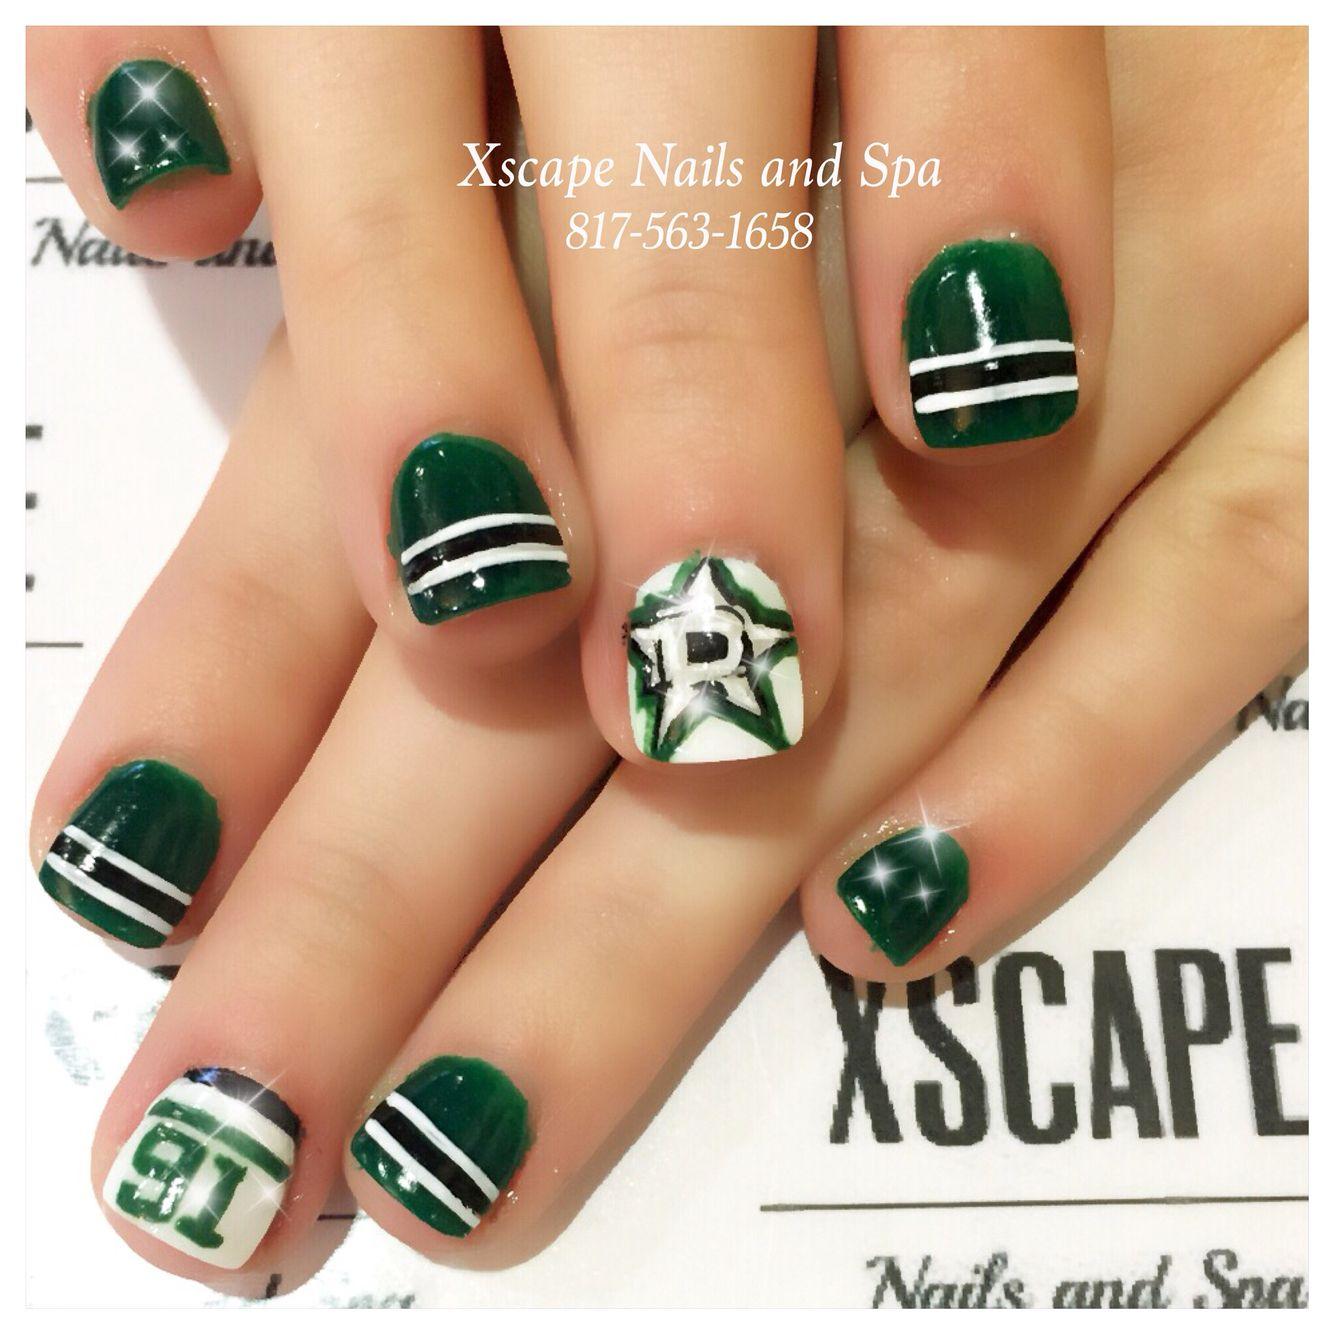 Dallas star nails | Cute Nails Designs | Pinterest | Dallas, Star ...